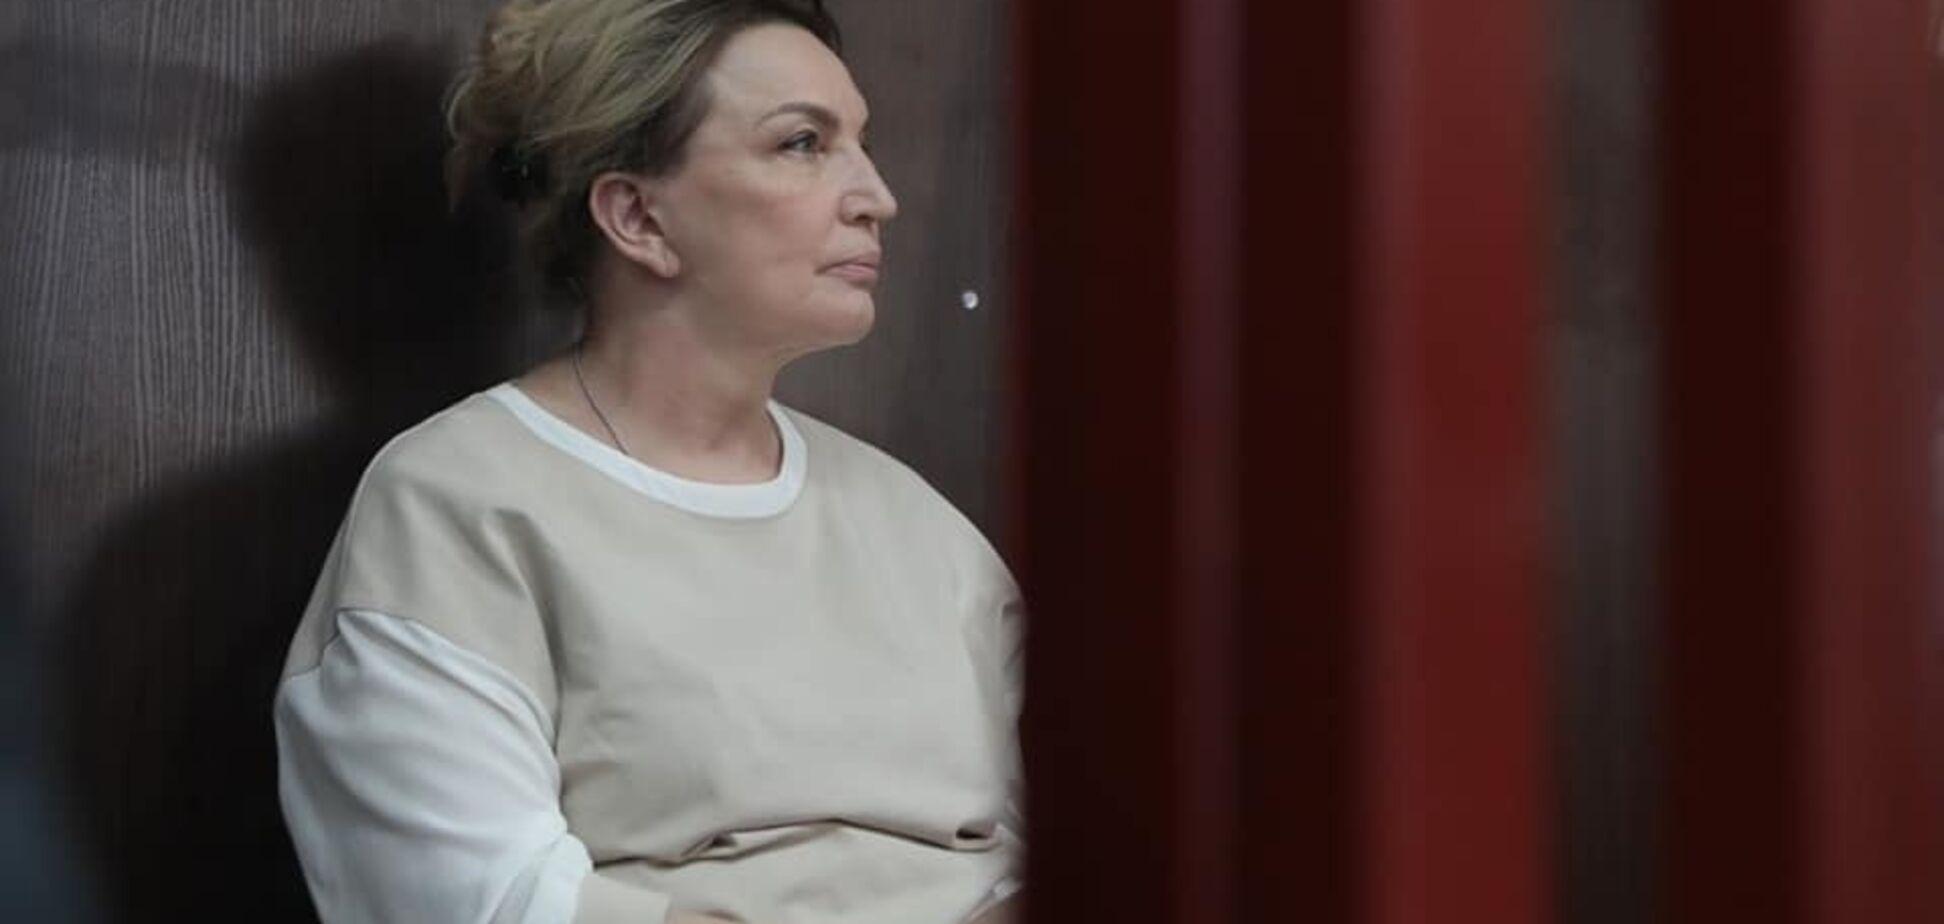 Экс-министр времен Януковича вышла из СИЗО: что известно